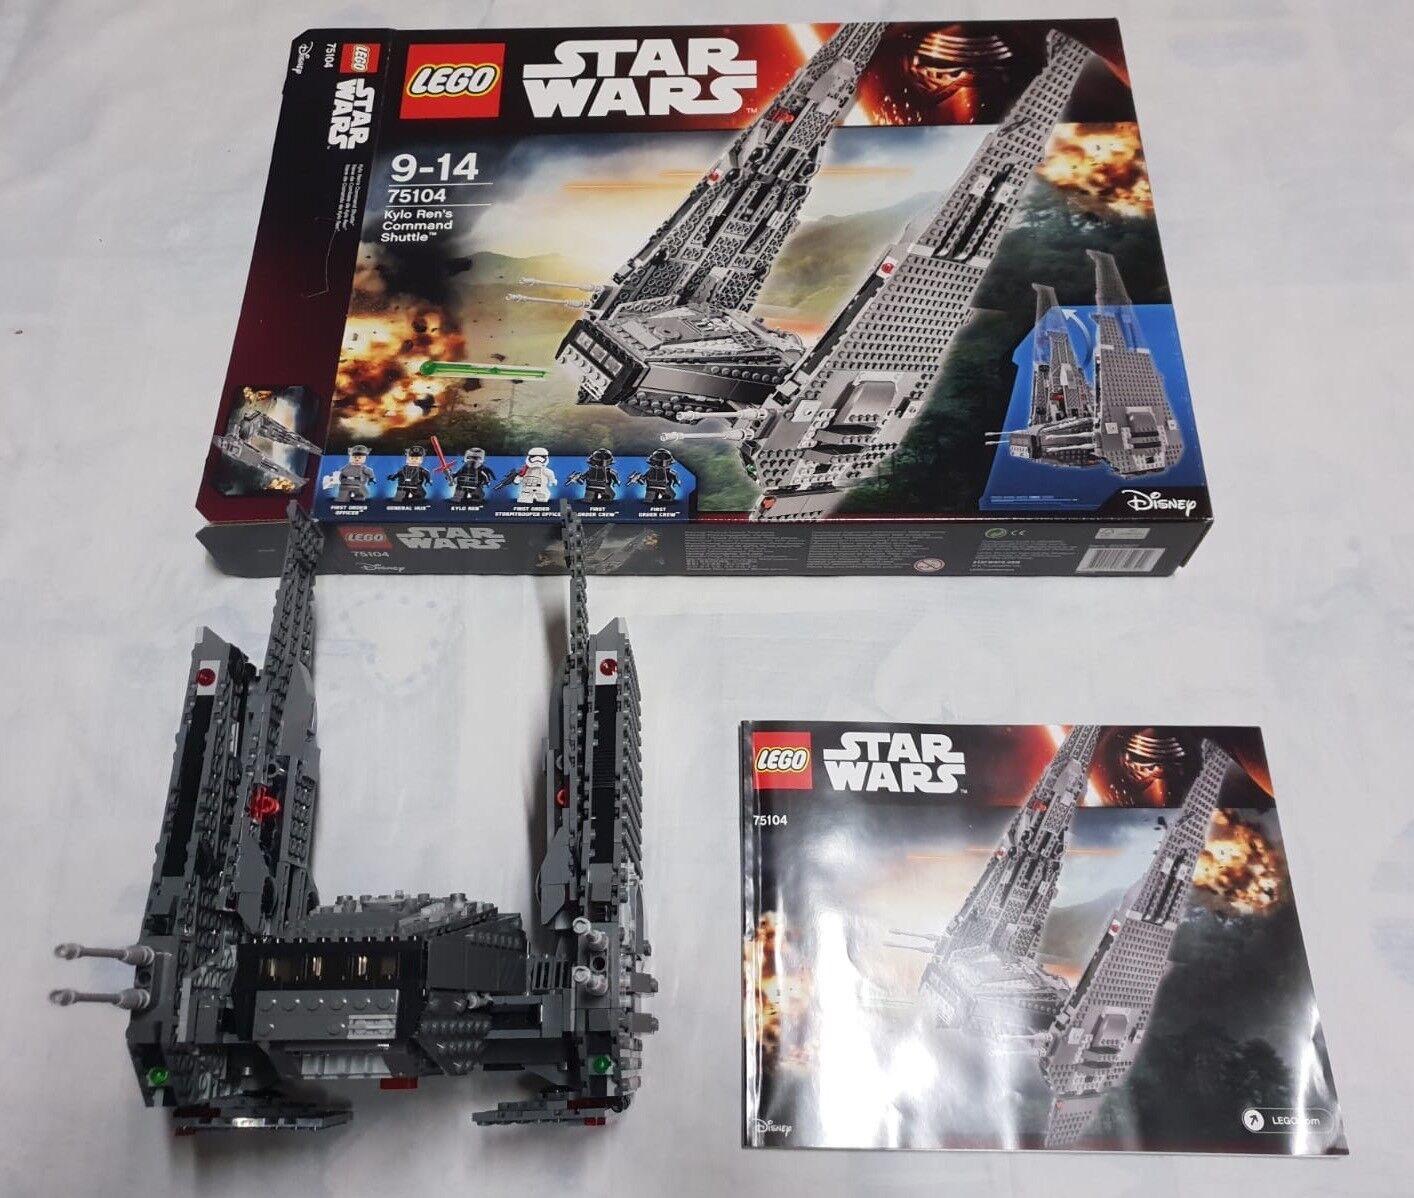 Lego Star Wars 75104  Kylo Ren Shuttle NO MINIFIGURE